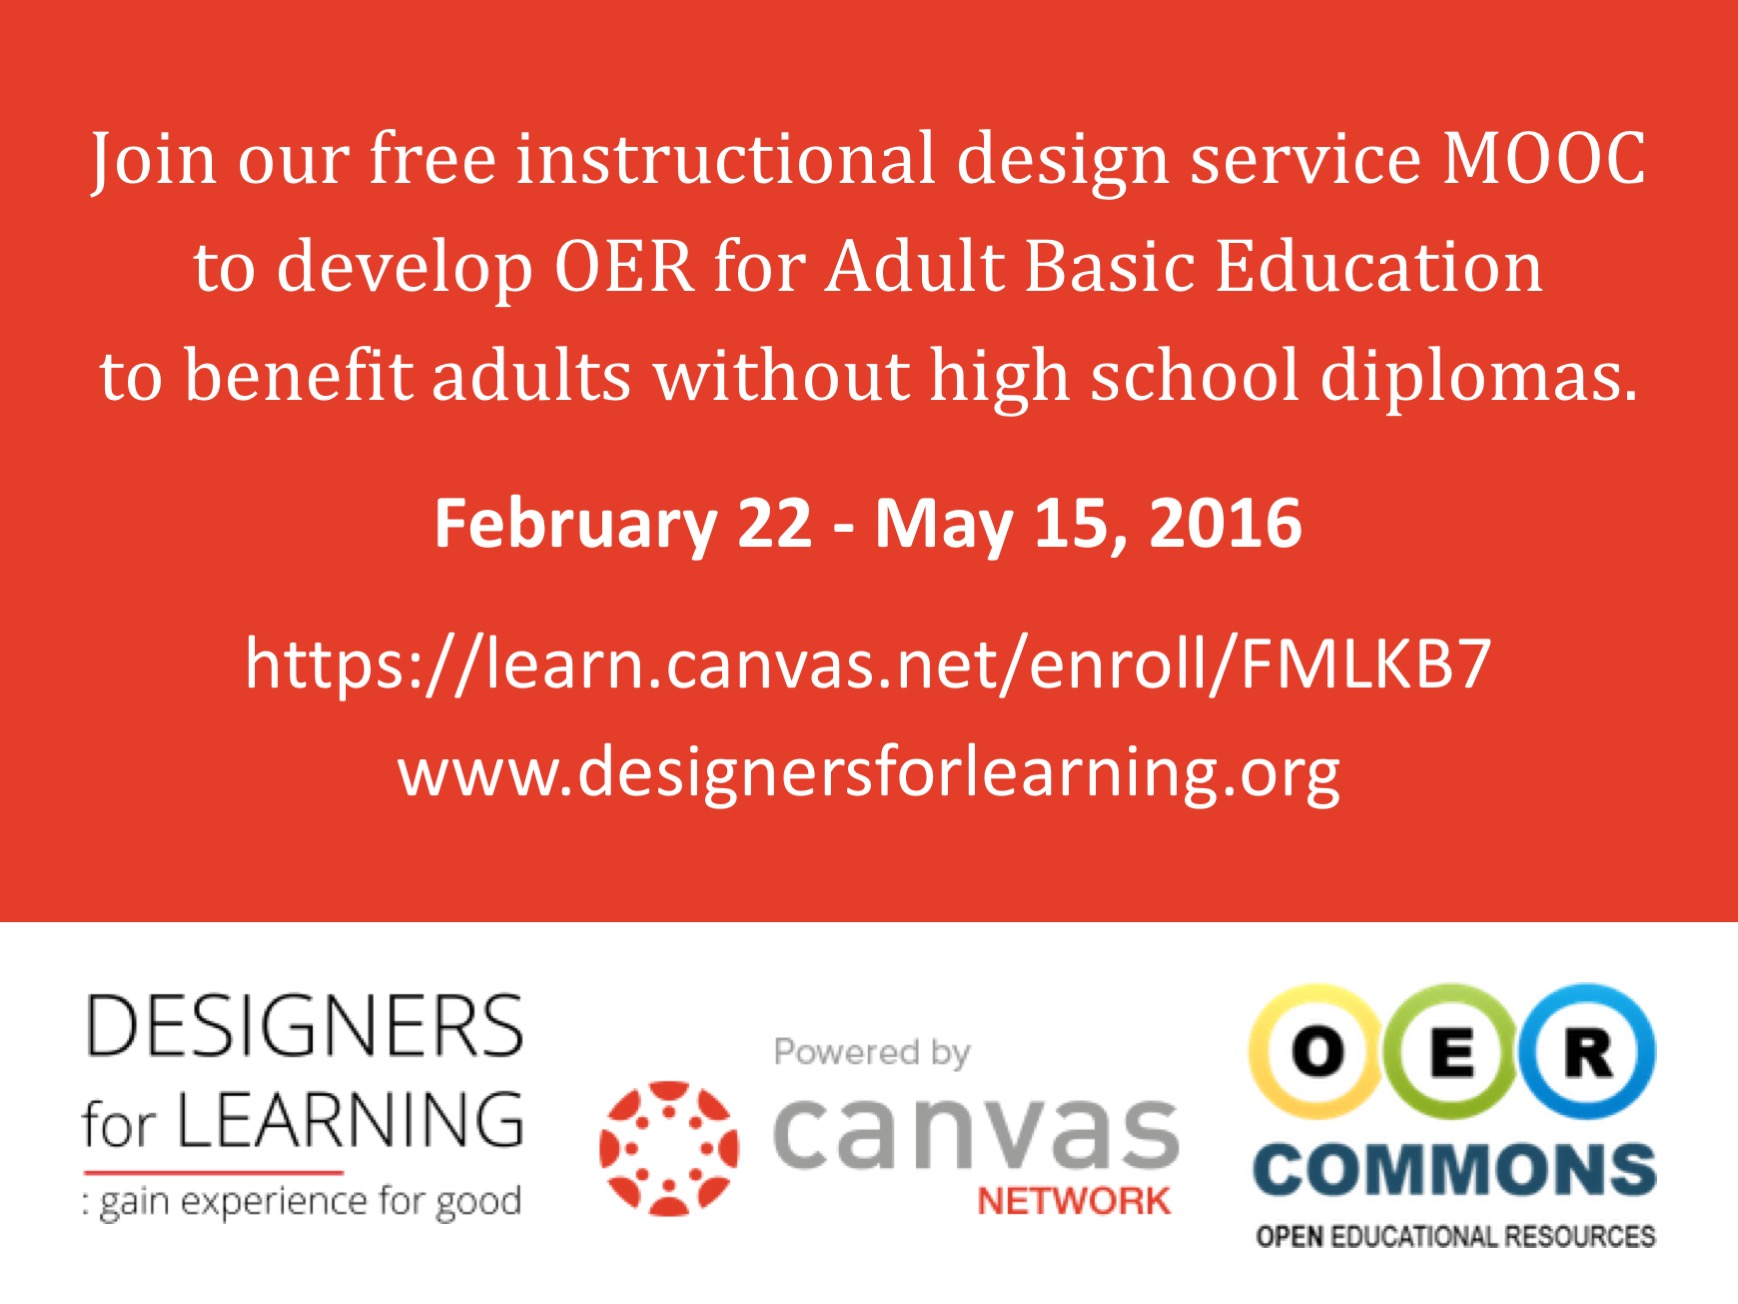 Join Us Open Education Consortium Webinar Jan 19th Designers For Learning